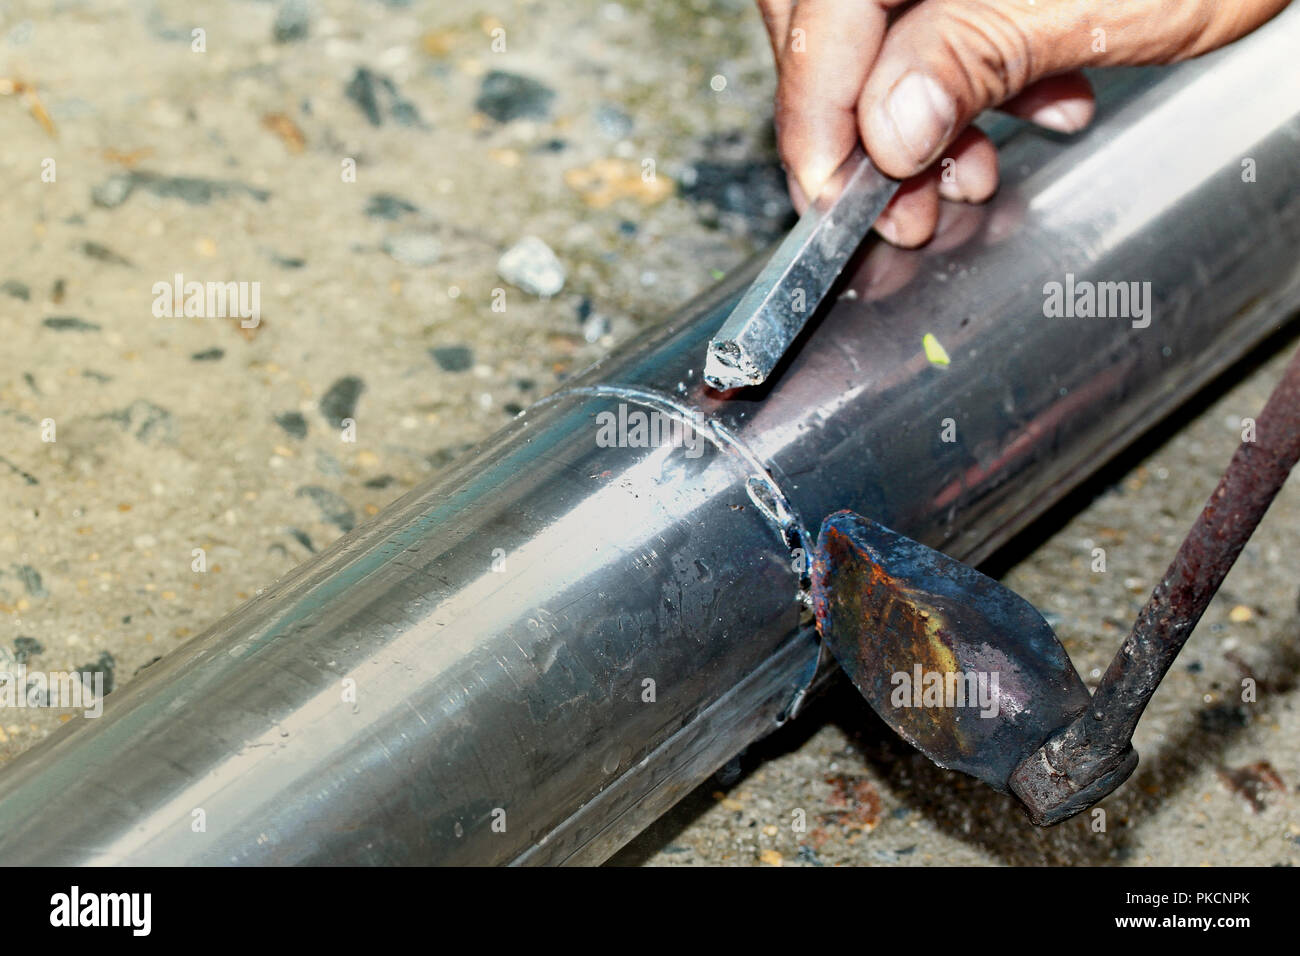 Aluminium Gutter Welding By Using Soldering Copper With Picnic Gas Technician Is Welding Aluminium Pipe By Using Soldering Copper Stock Photo Alamy